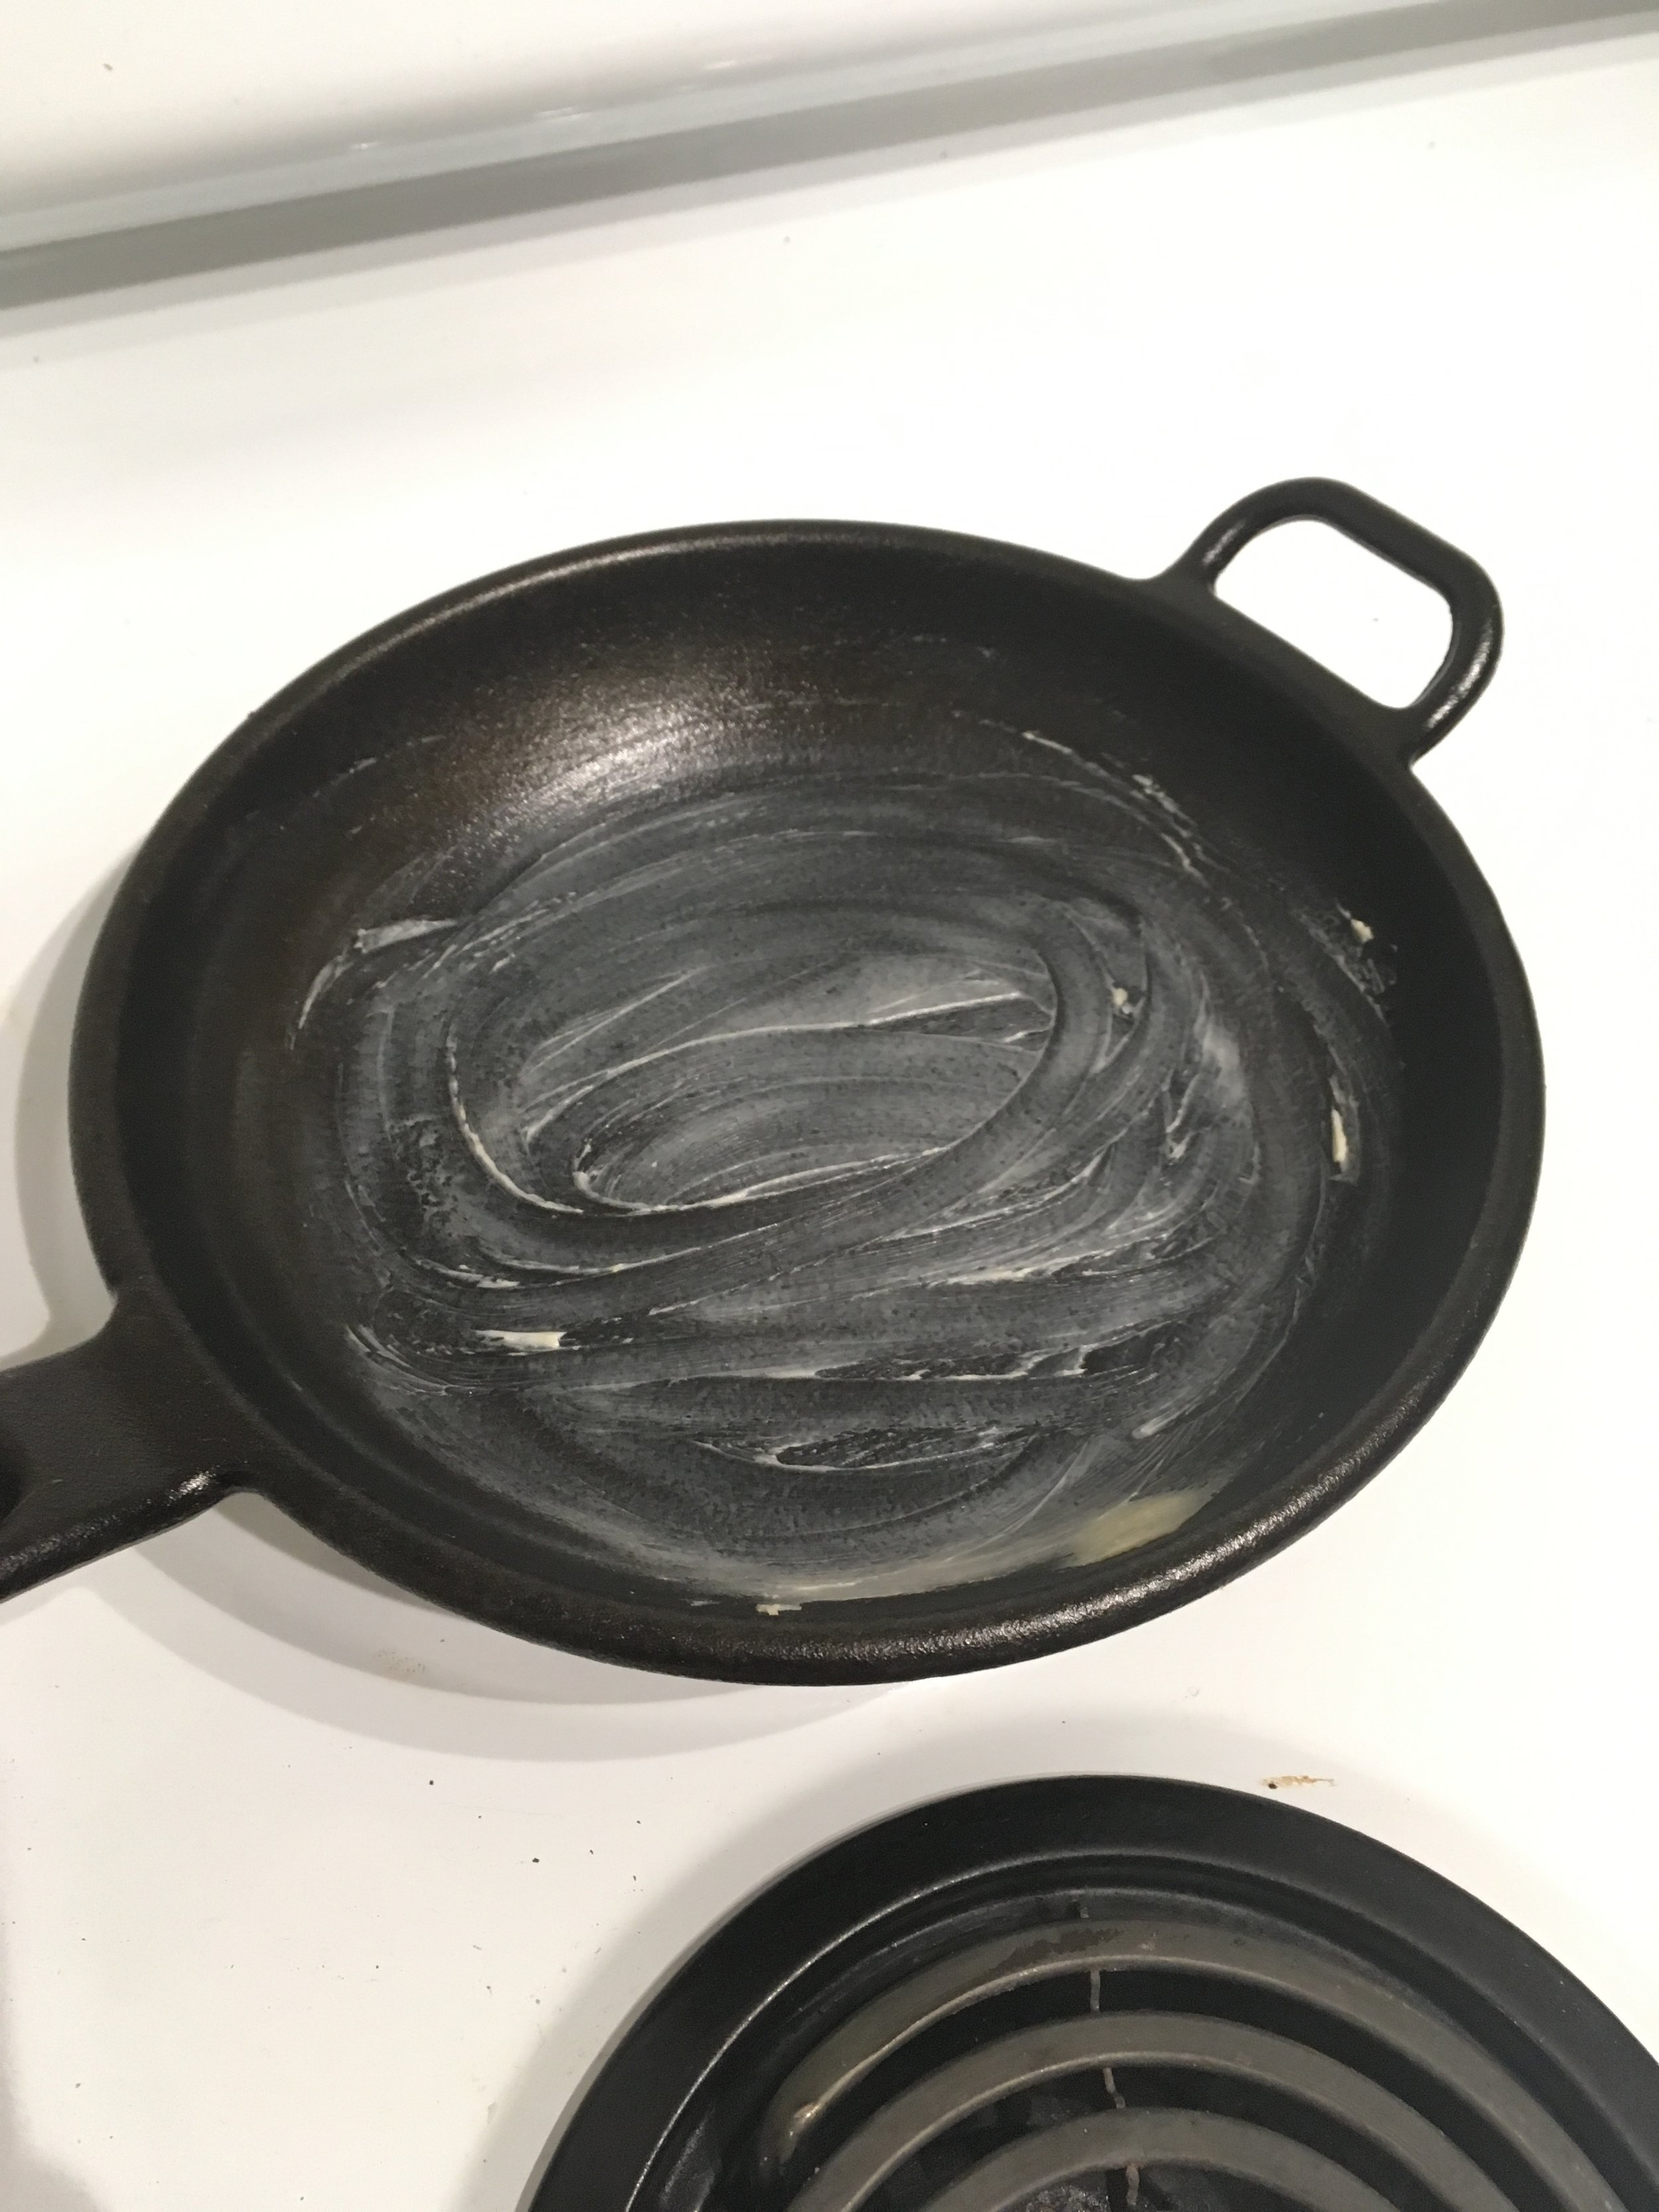 Buttered cast-iron pan